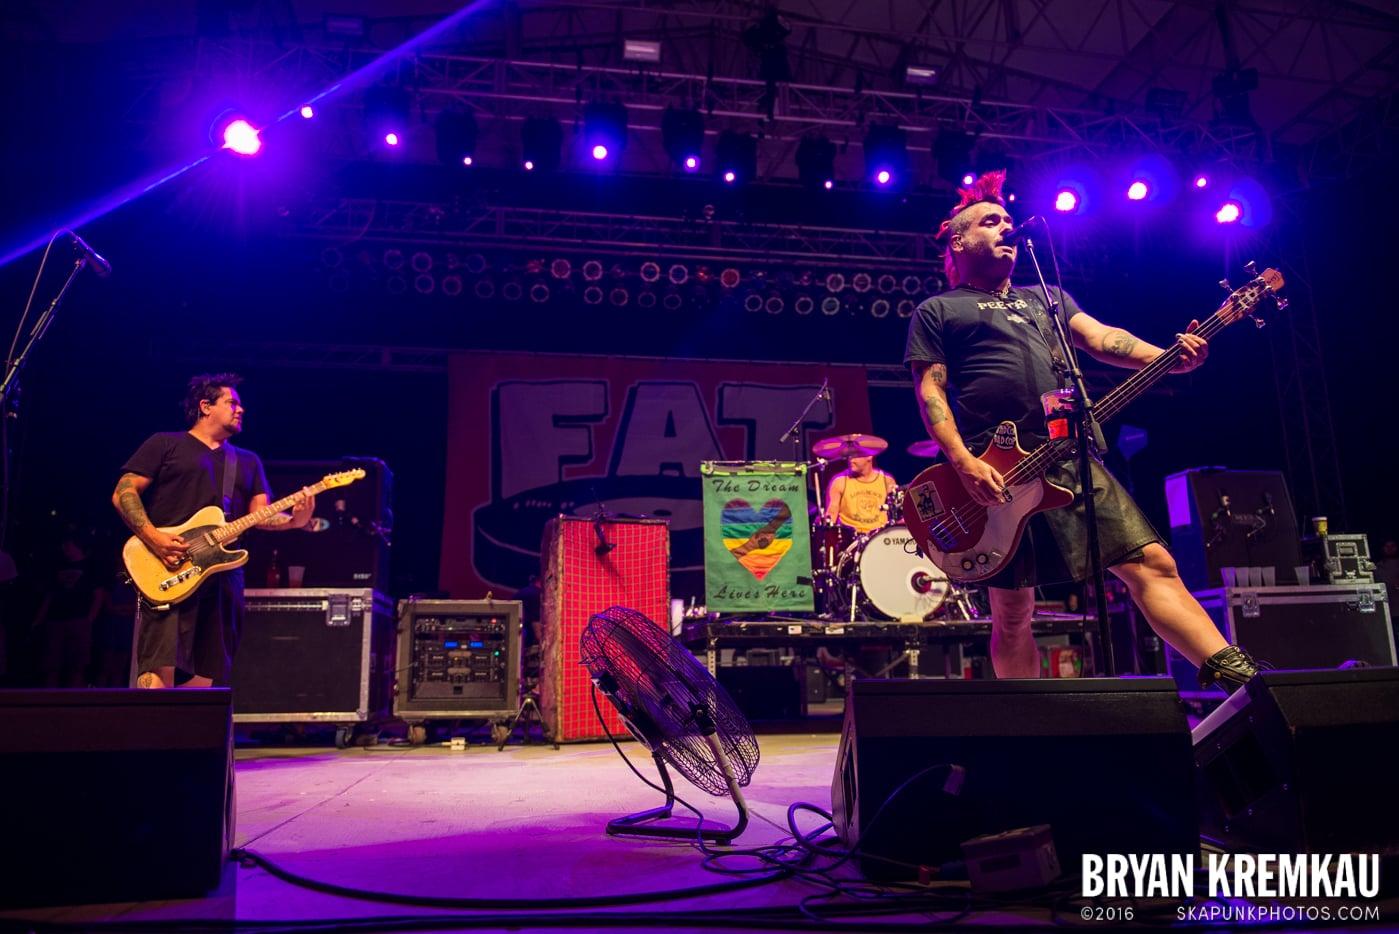 NOFX @ Stone Pony Summer Stage, Asbury Park, NJ - 8.15.15 (41)